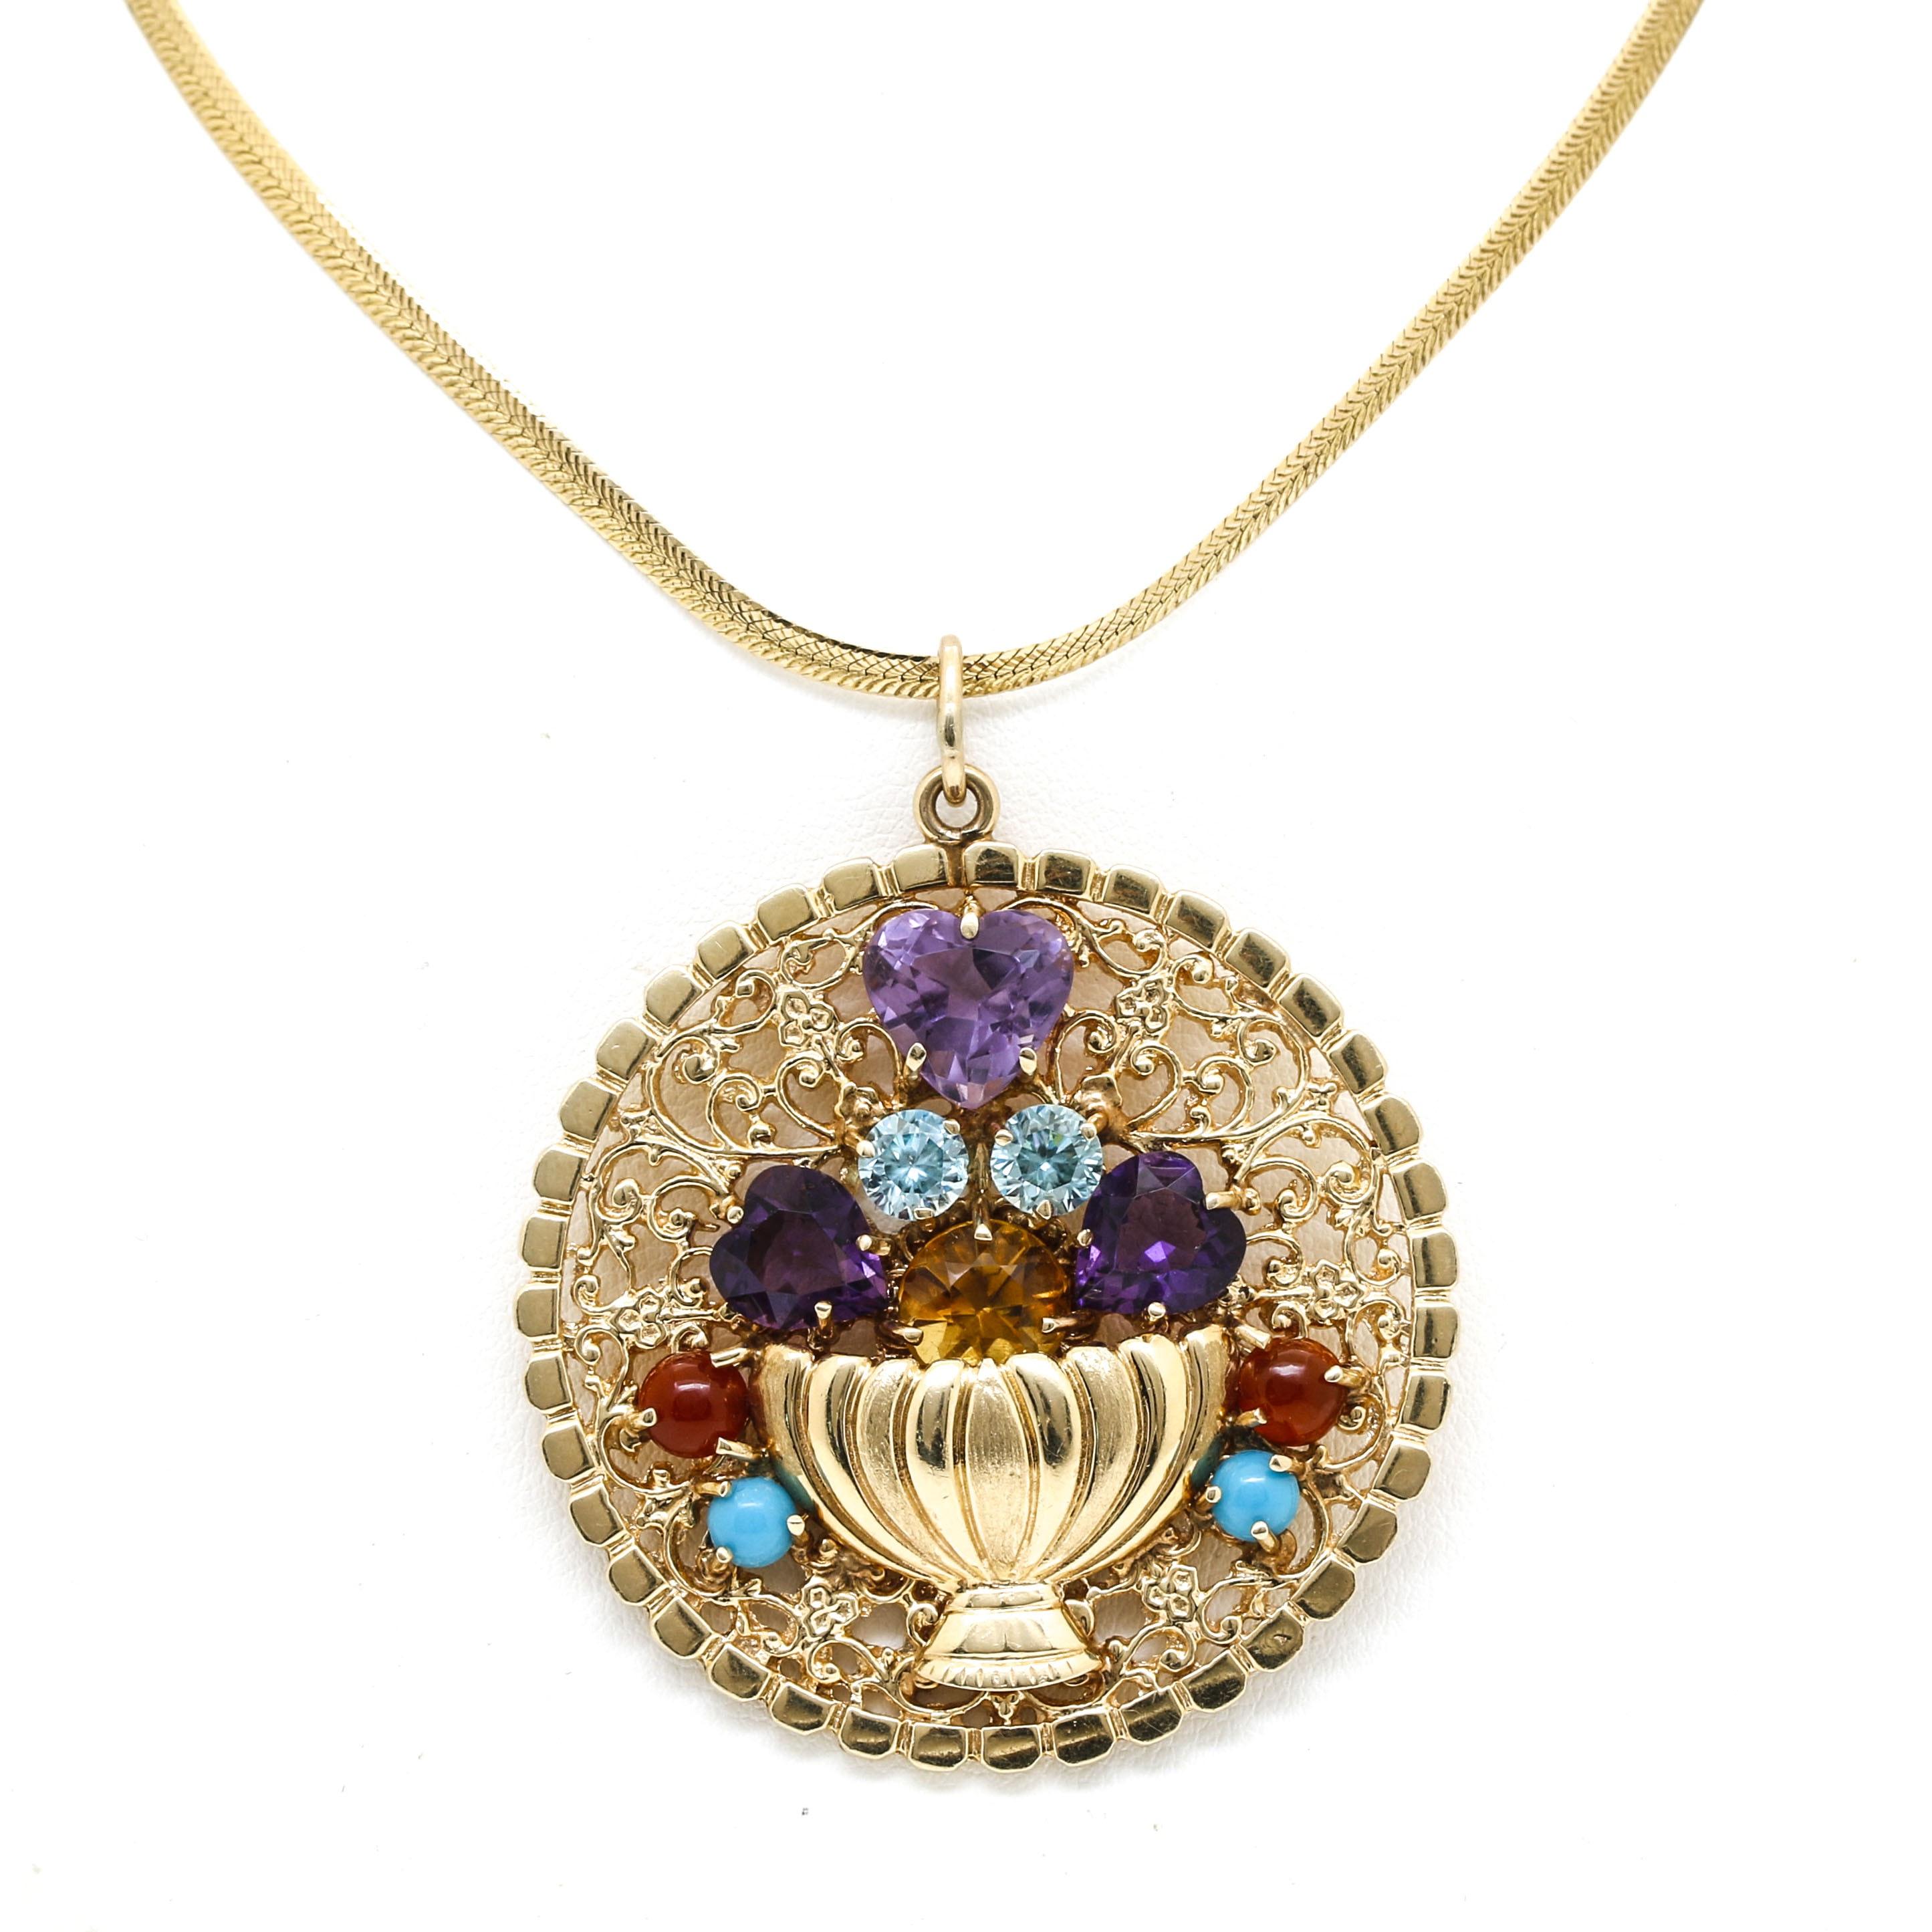 14K Yellow Gold Gemstone Pendant Necklace